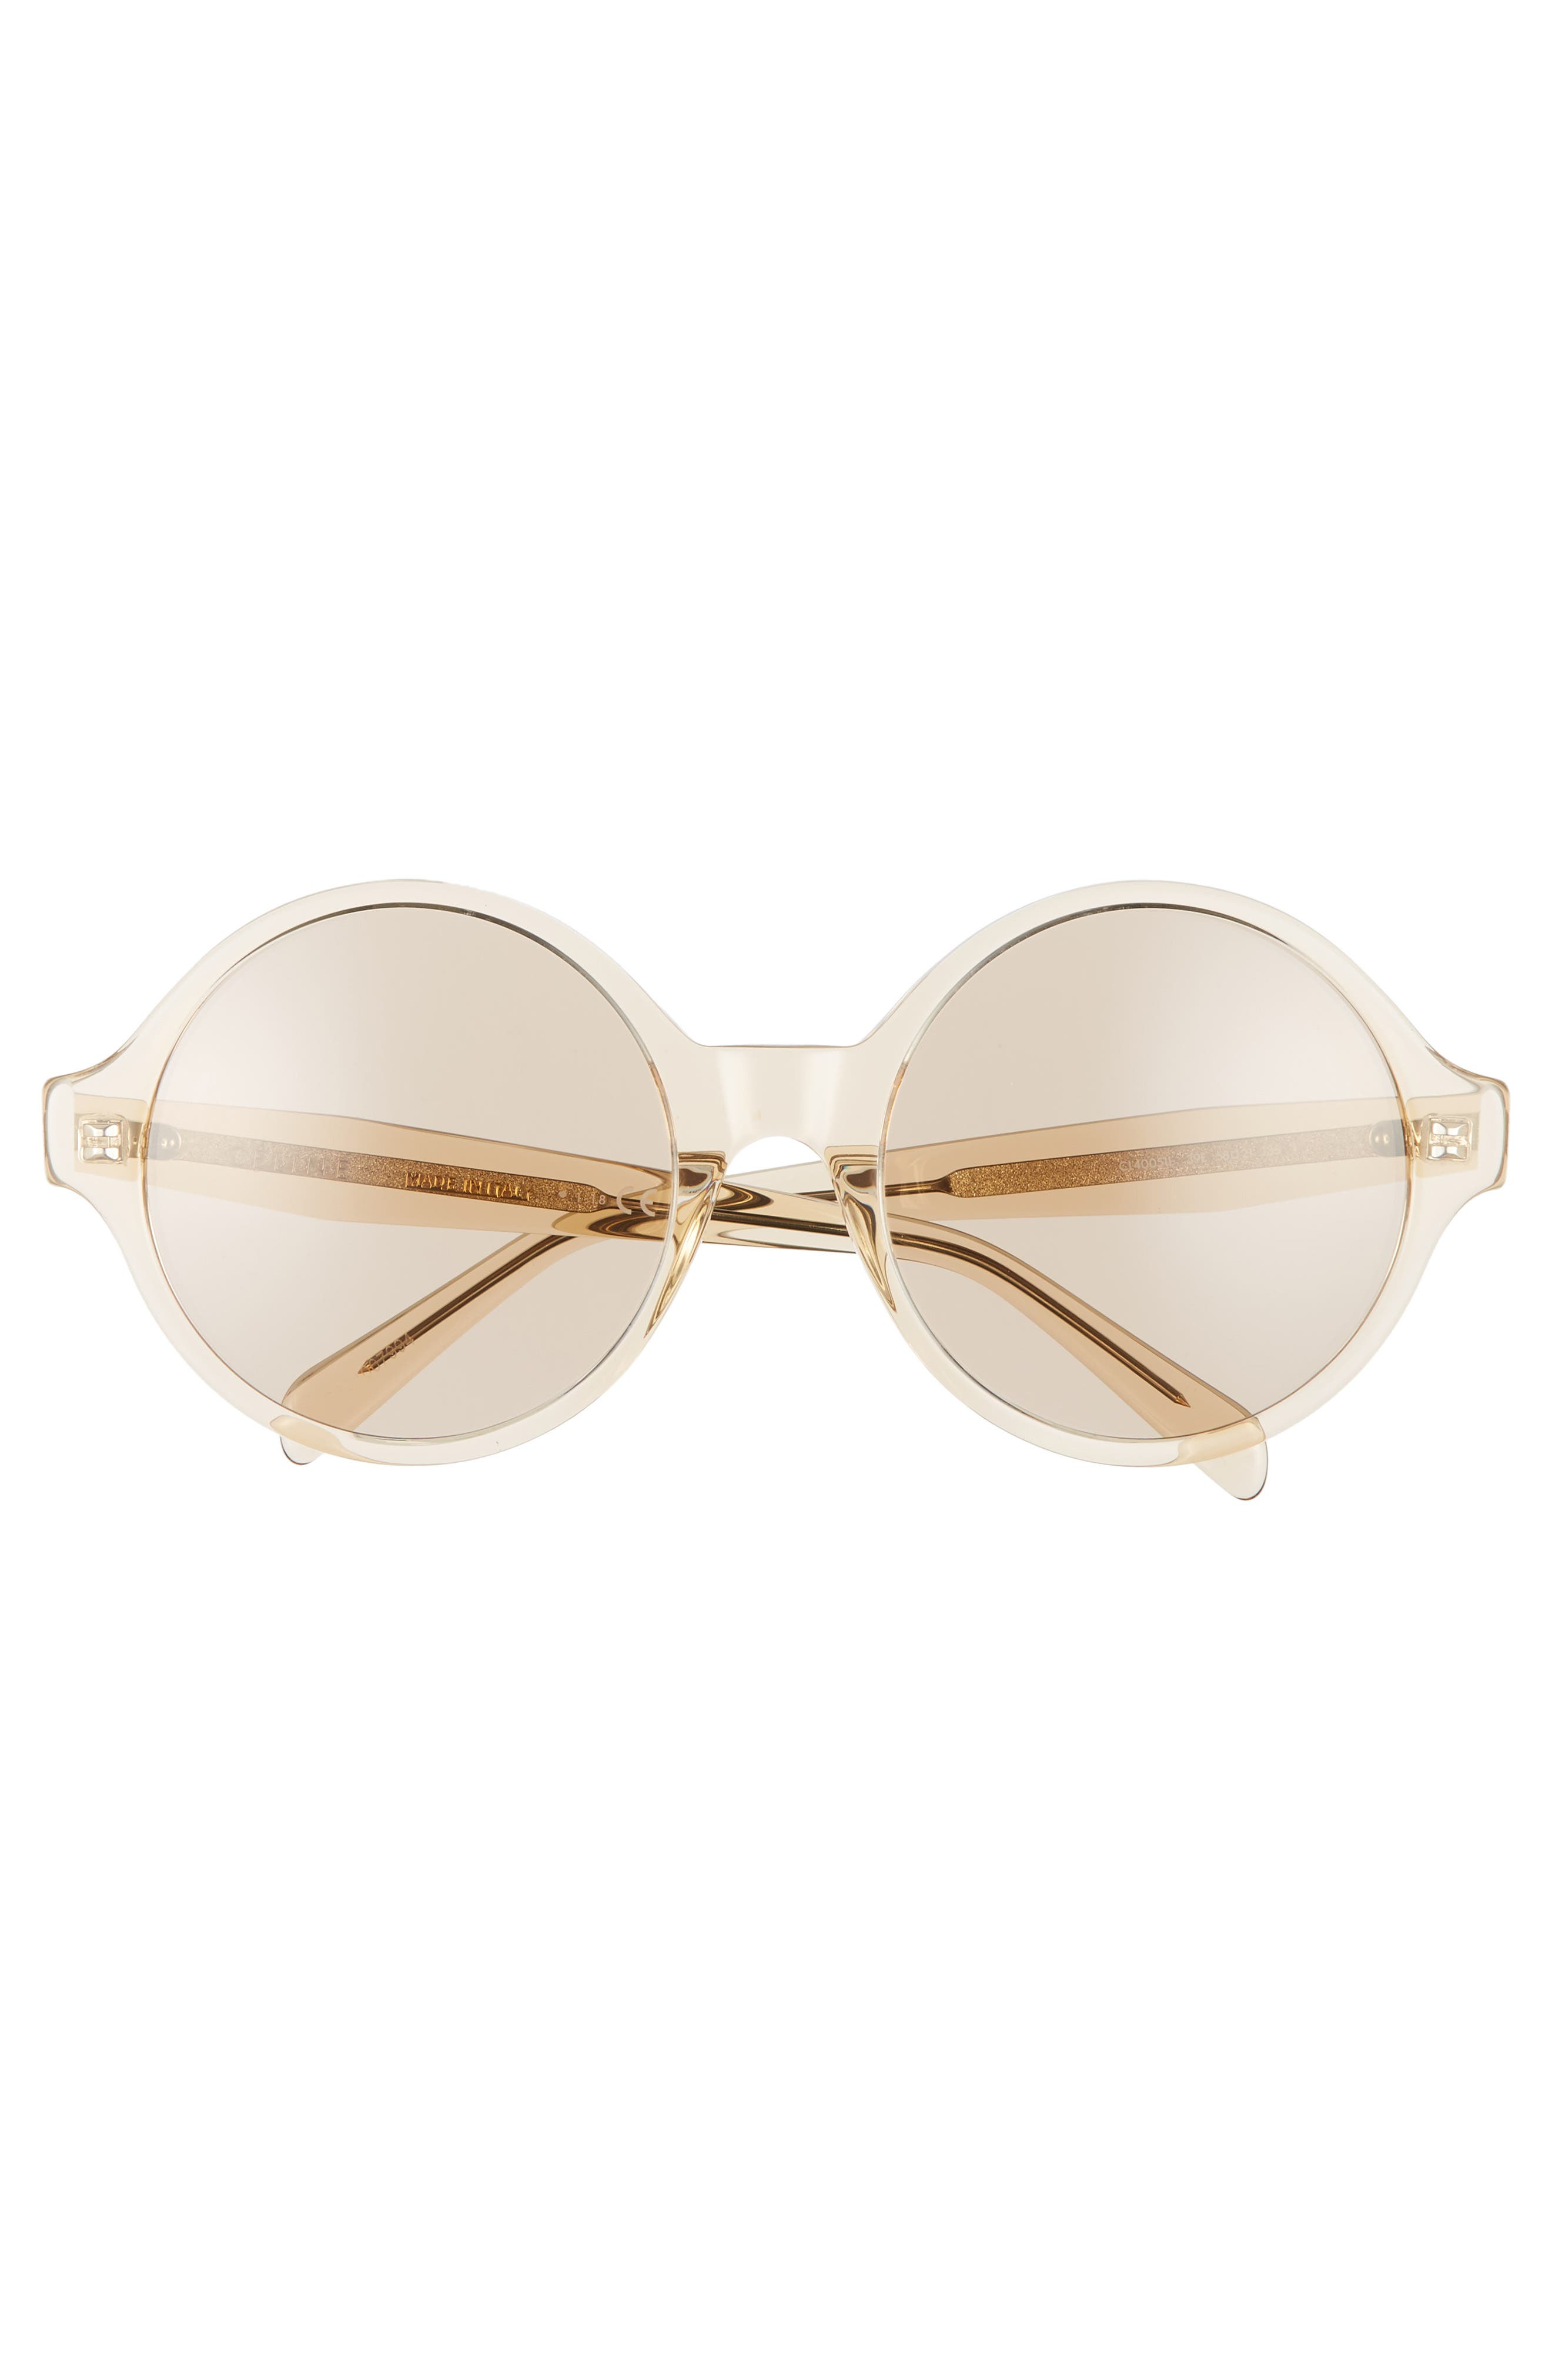 ,                             58mm Round Sunglasses,                             Alternate thumbnail 3, color,                             TRANSPARENT OCHRE/ LIGHT BROWN